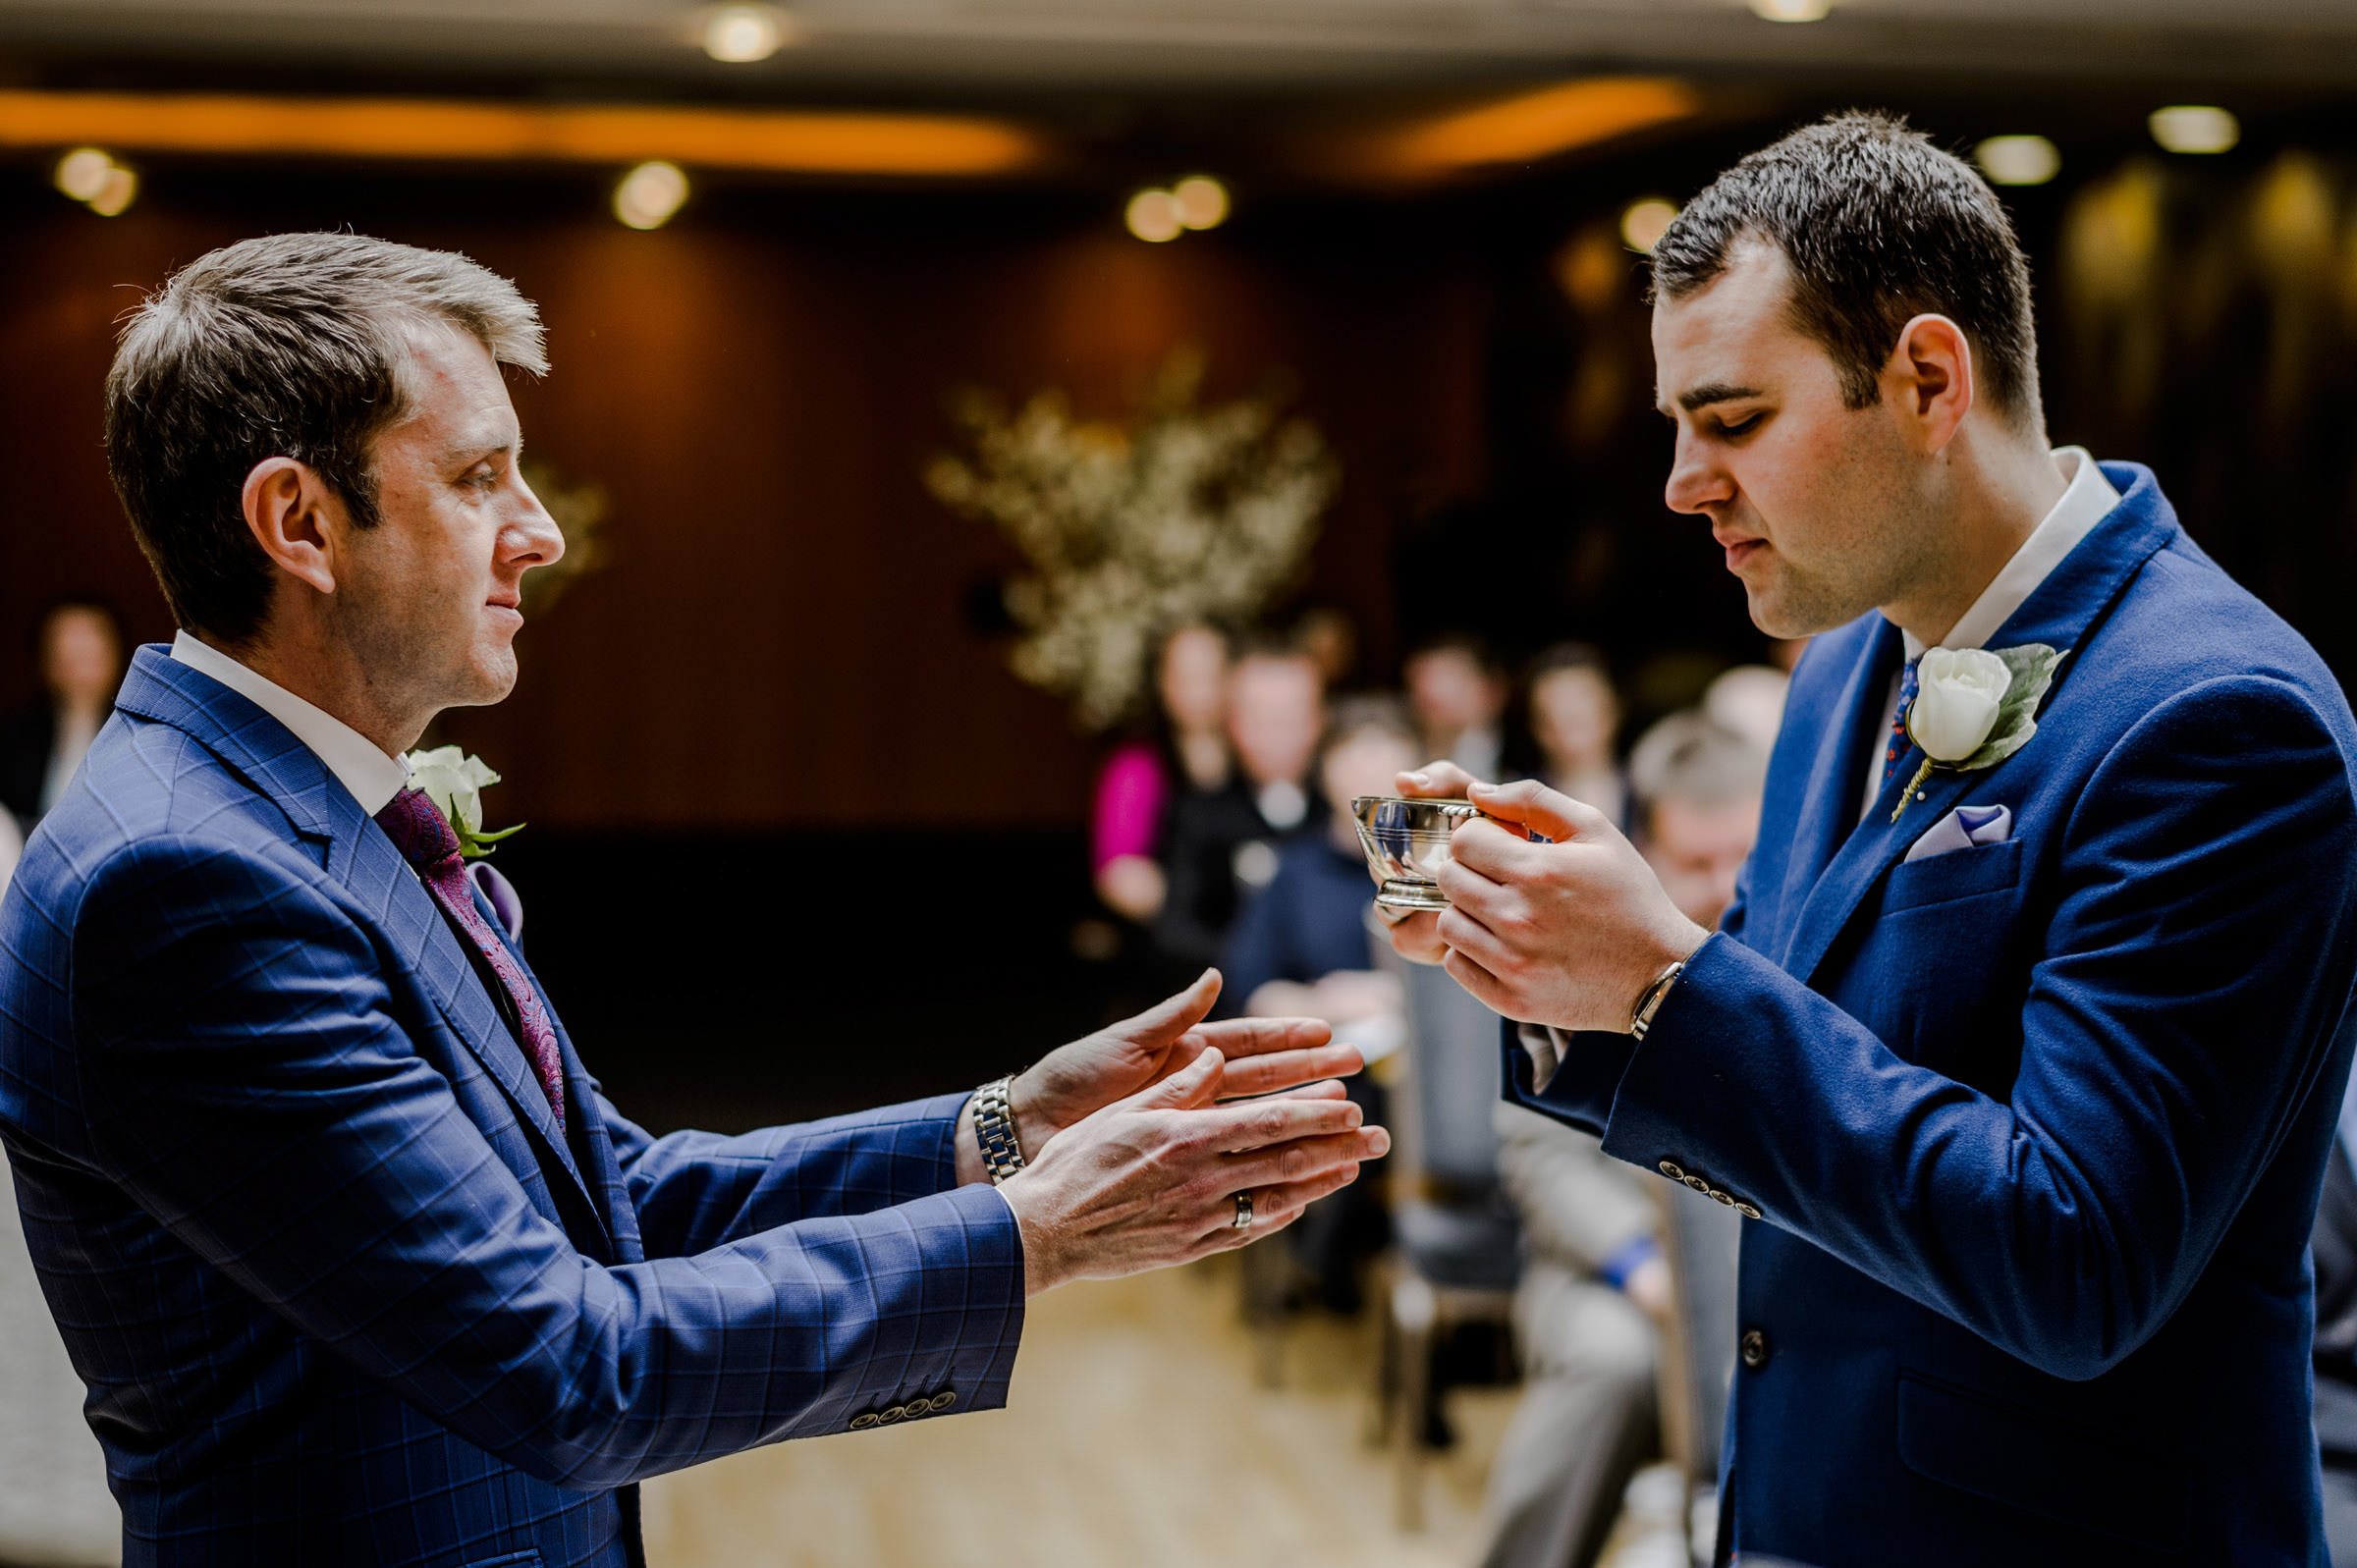 Wedding photography at Mallory Court 011.jpg